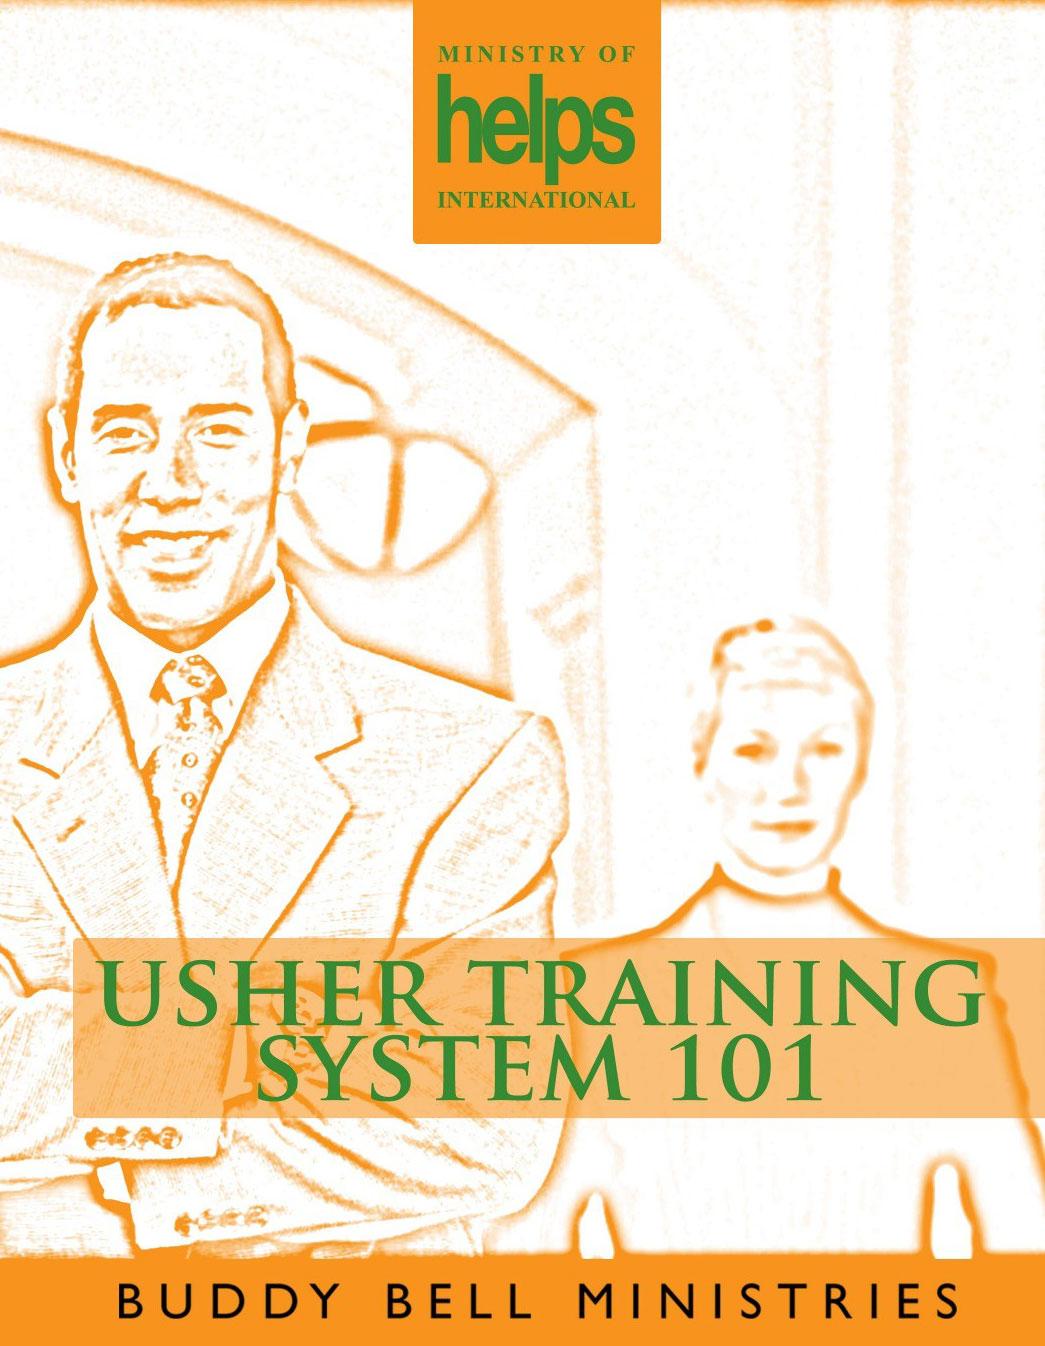 usher training system 101 ministry of helps international aka dr rh mohi org usher training manual pdf usher training manual for baptist church